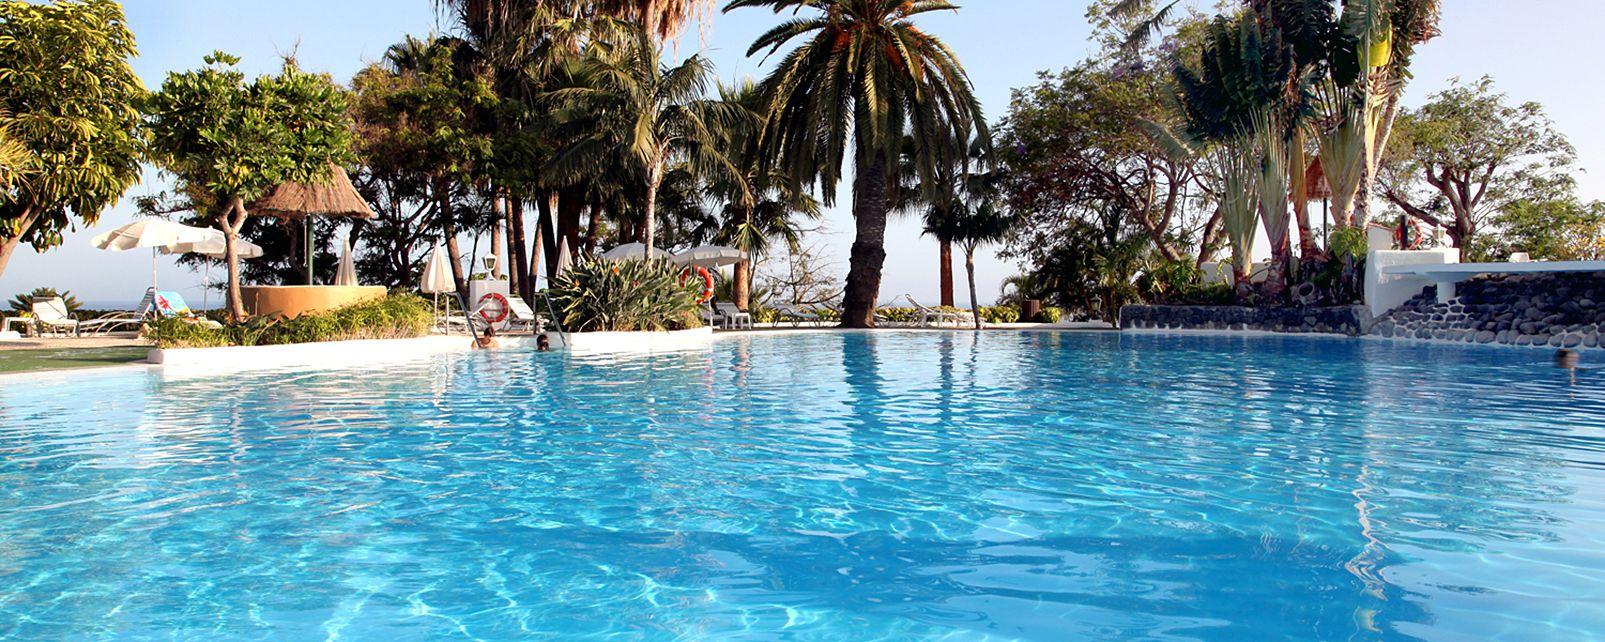 Hotel Jardin Tecina Playa De Santiago